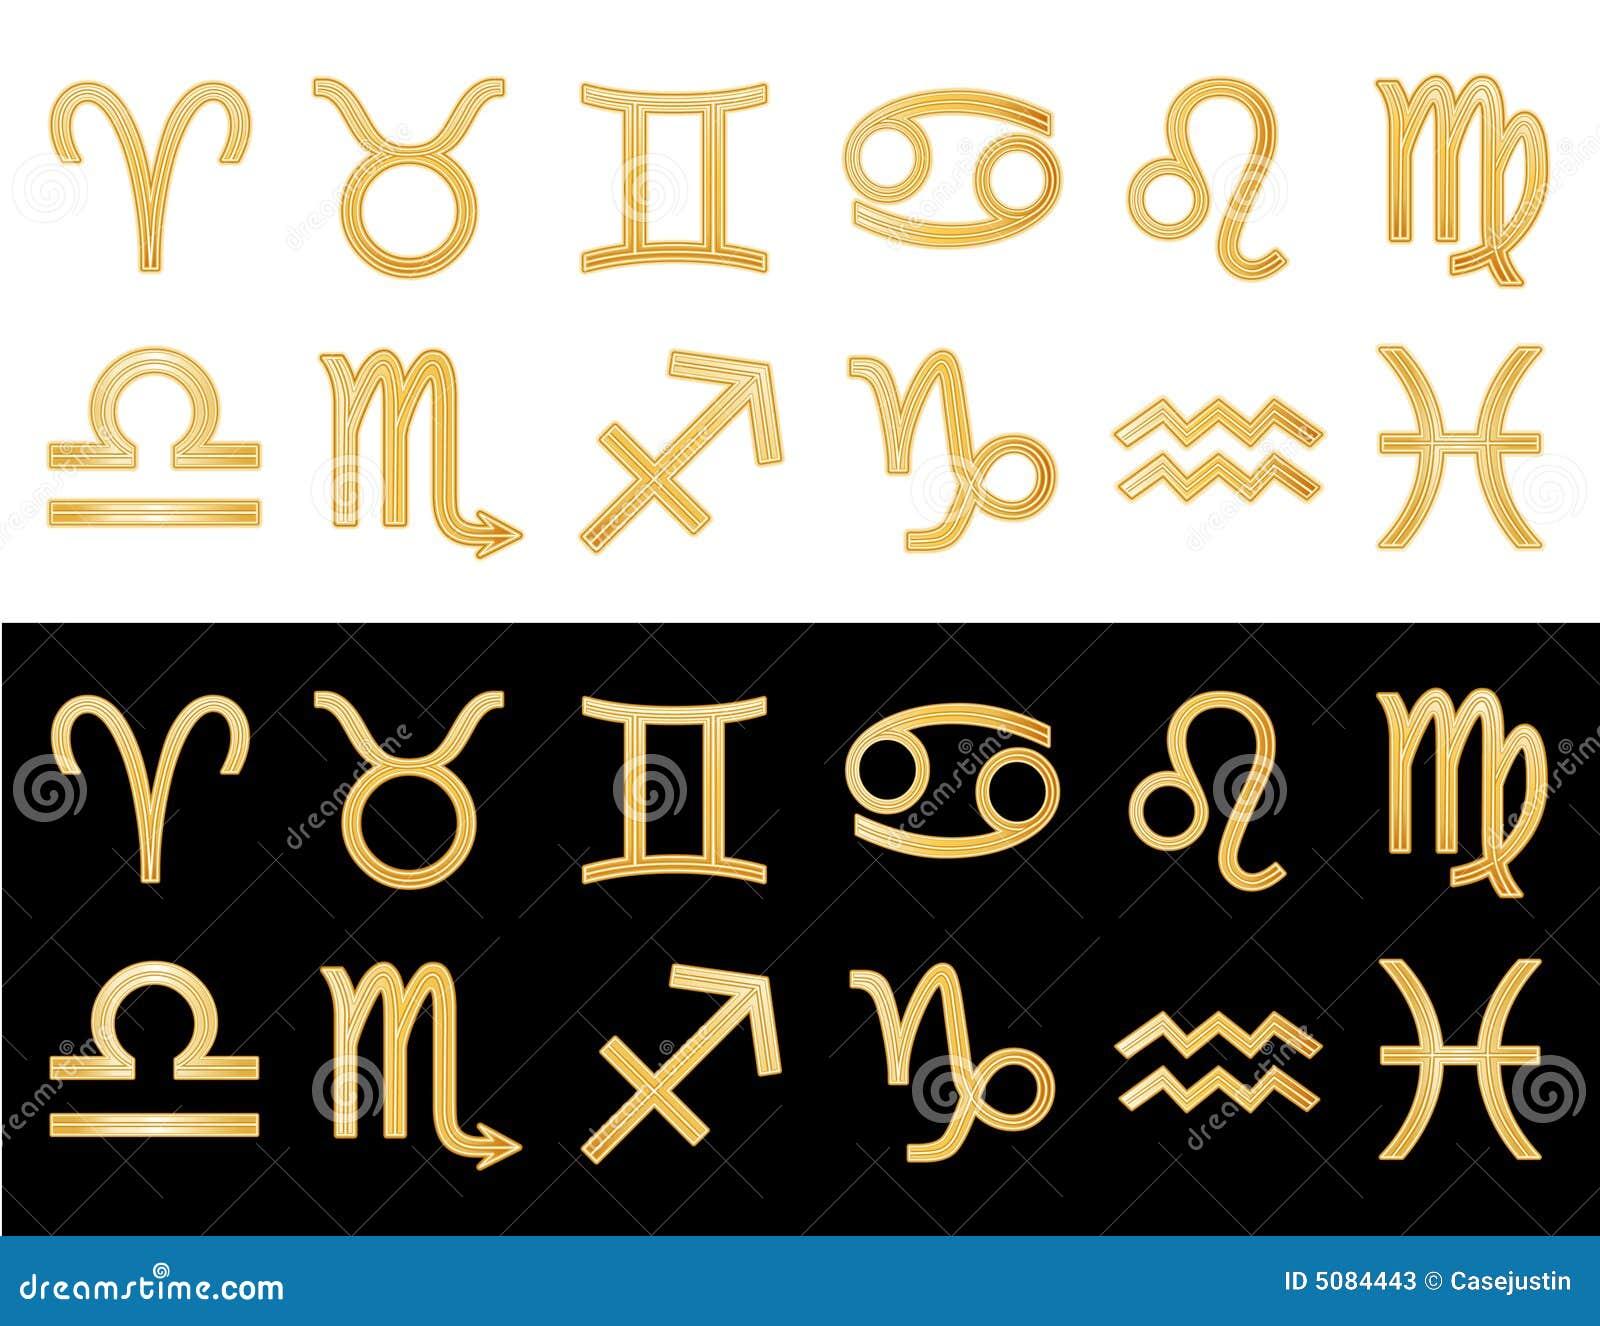 Golden Horoscope Symbols Stock Vector Illustration Of Icon 5084443